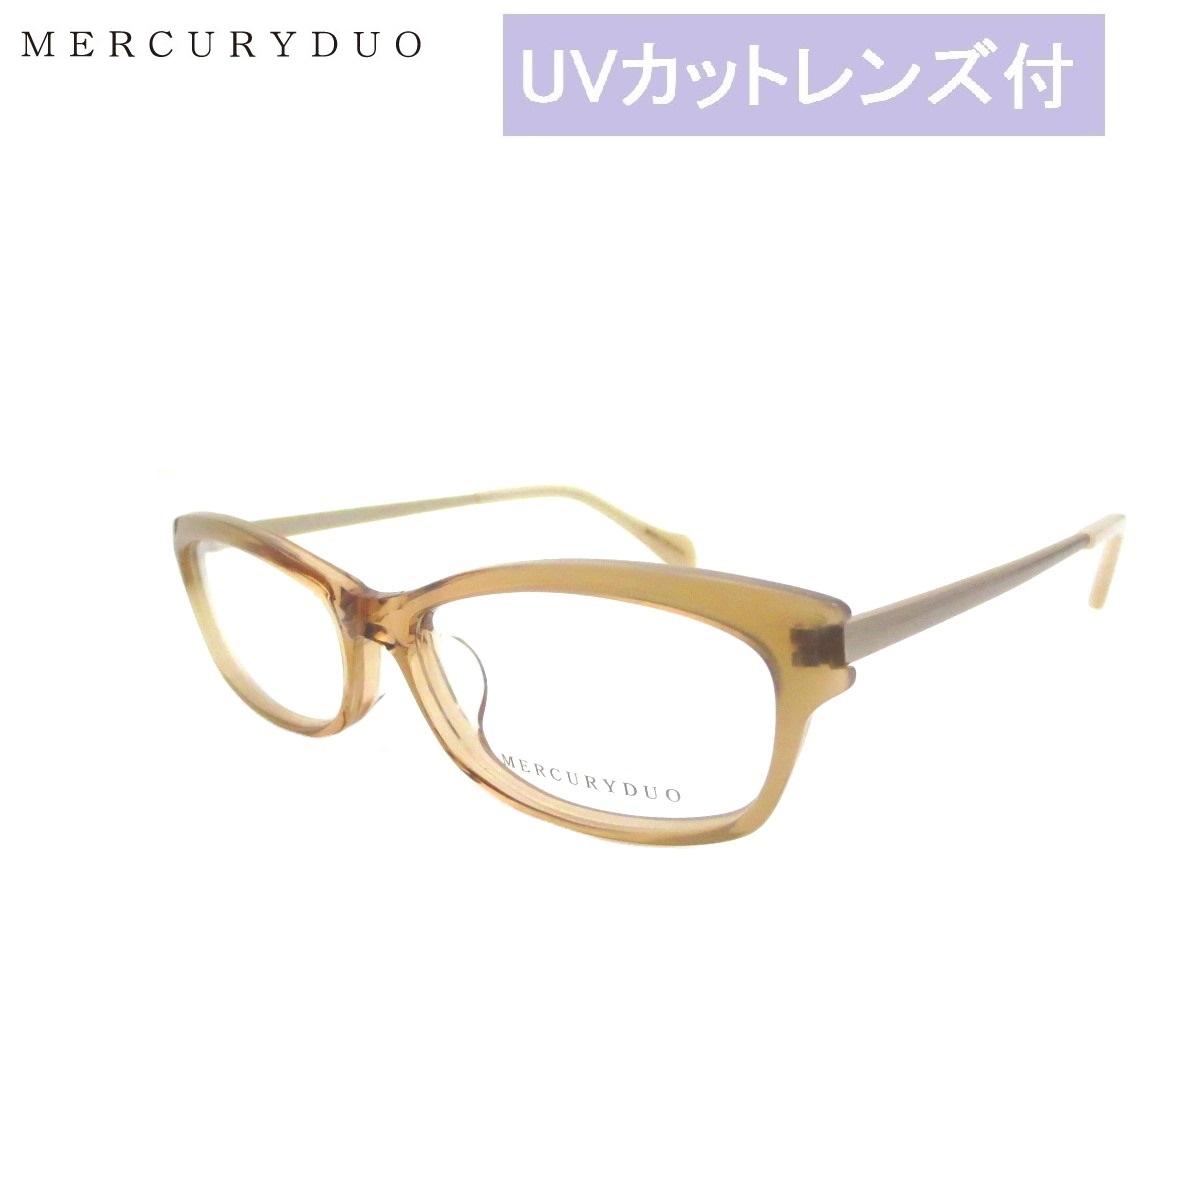 MERCURYDUO(マーキュリーデュオ)MDF8001 04(54)セミオーダー老眼鏡 中間度数有 UVカット(UV400)&防汚コート付レンズ +1.00 +1.25 +1.50 +1.75 +2.00 +2.25 +2.50 +2.75 +3.00 +3.50 +4.00【コンビニ受取対応商品】